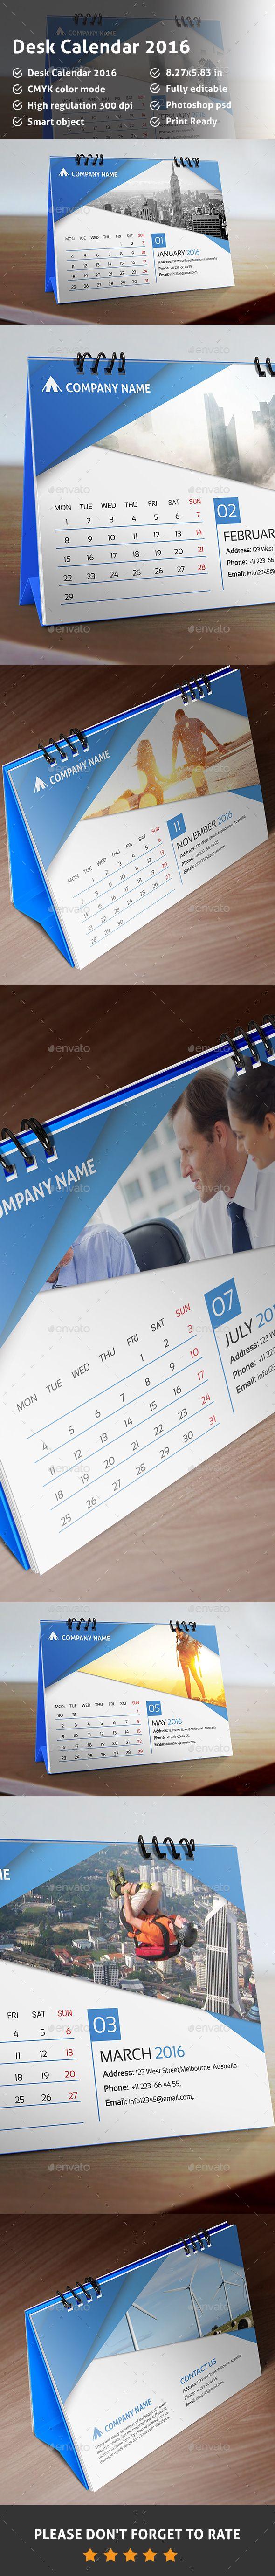 Desk Calendar 2016 Template PSD #design Download: http://graphicriver.net/item/desk-calendar-2016/13710081?ref=ksioks